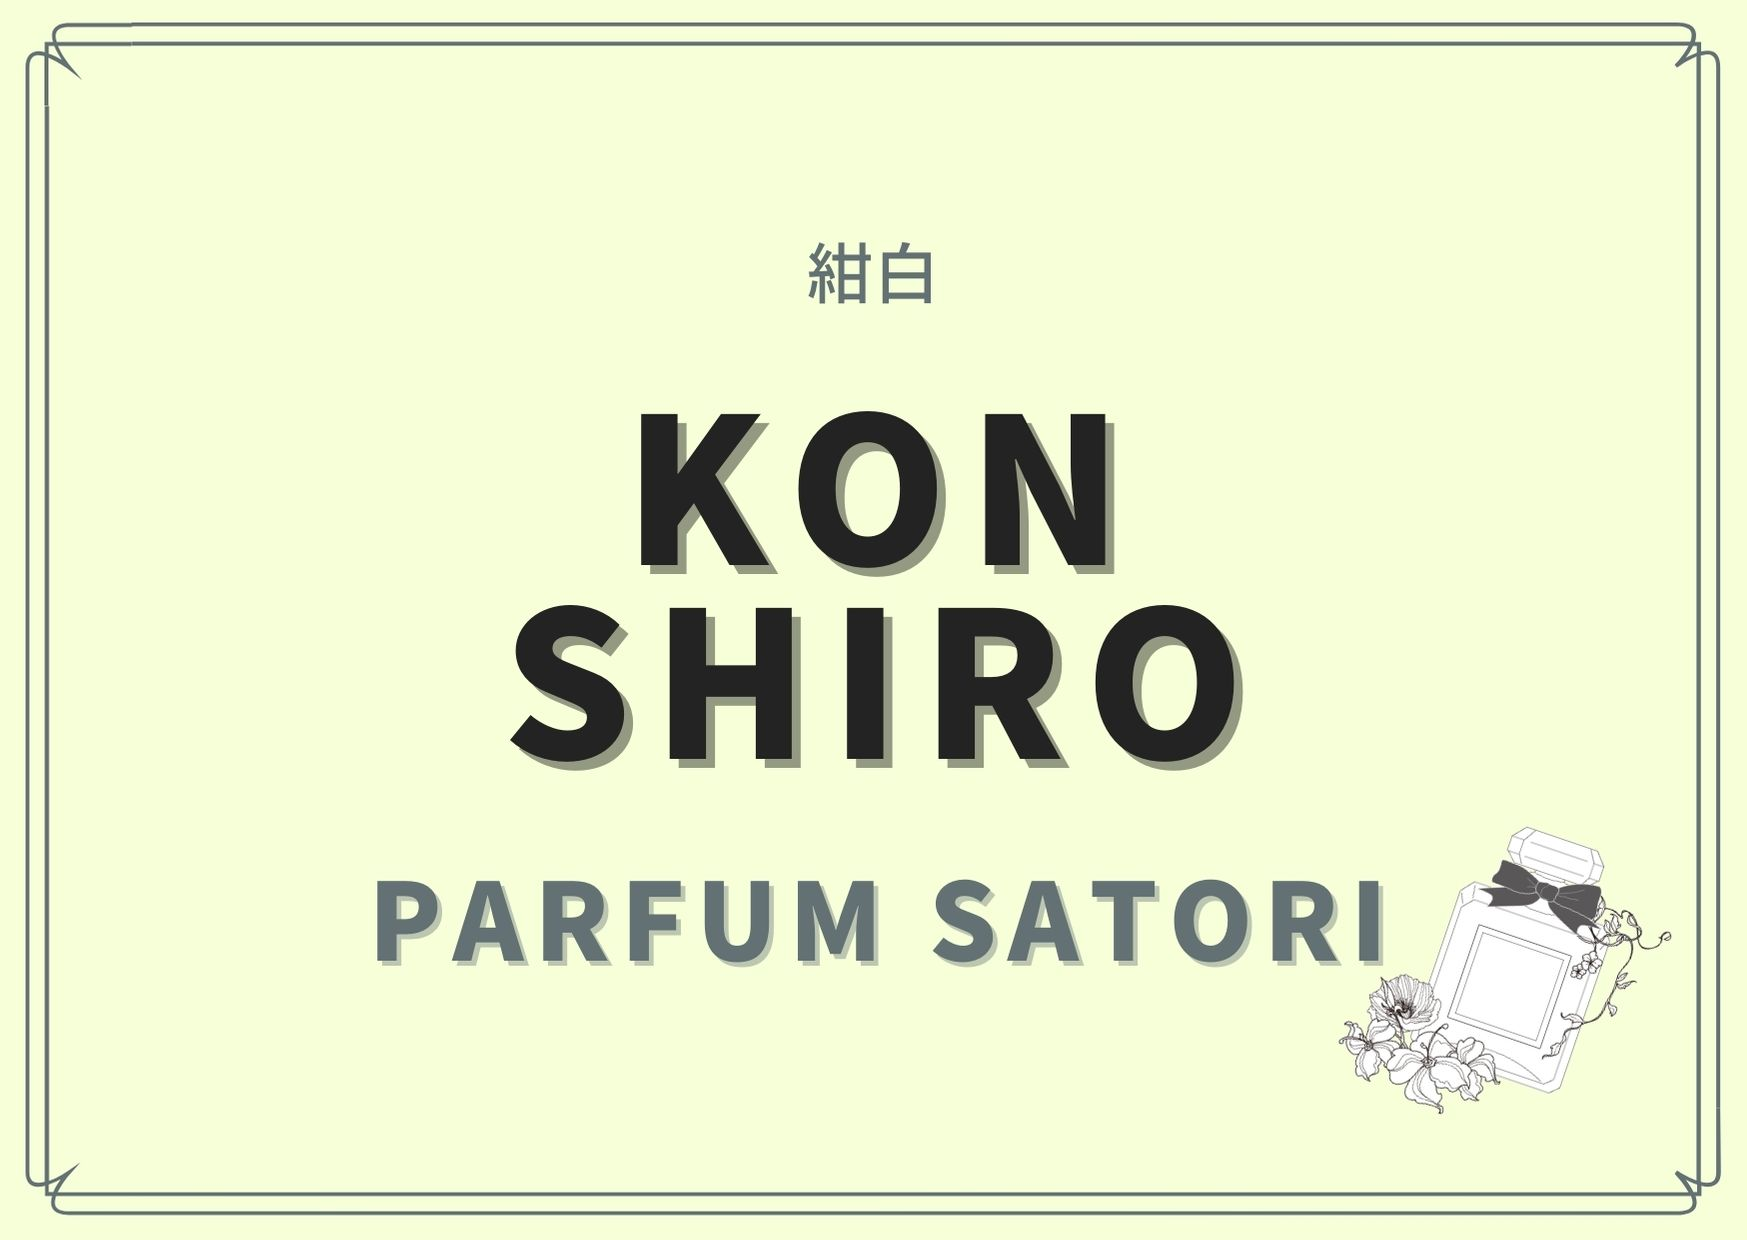 KON SHIRO(紺白)/PARFUM SATORI(パルファン サトリ)